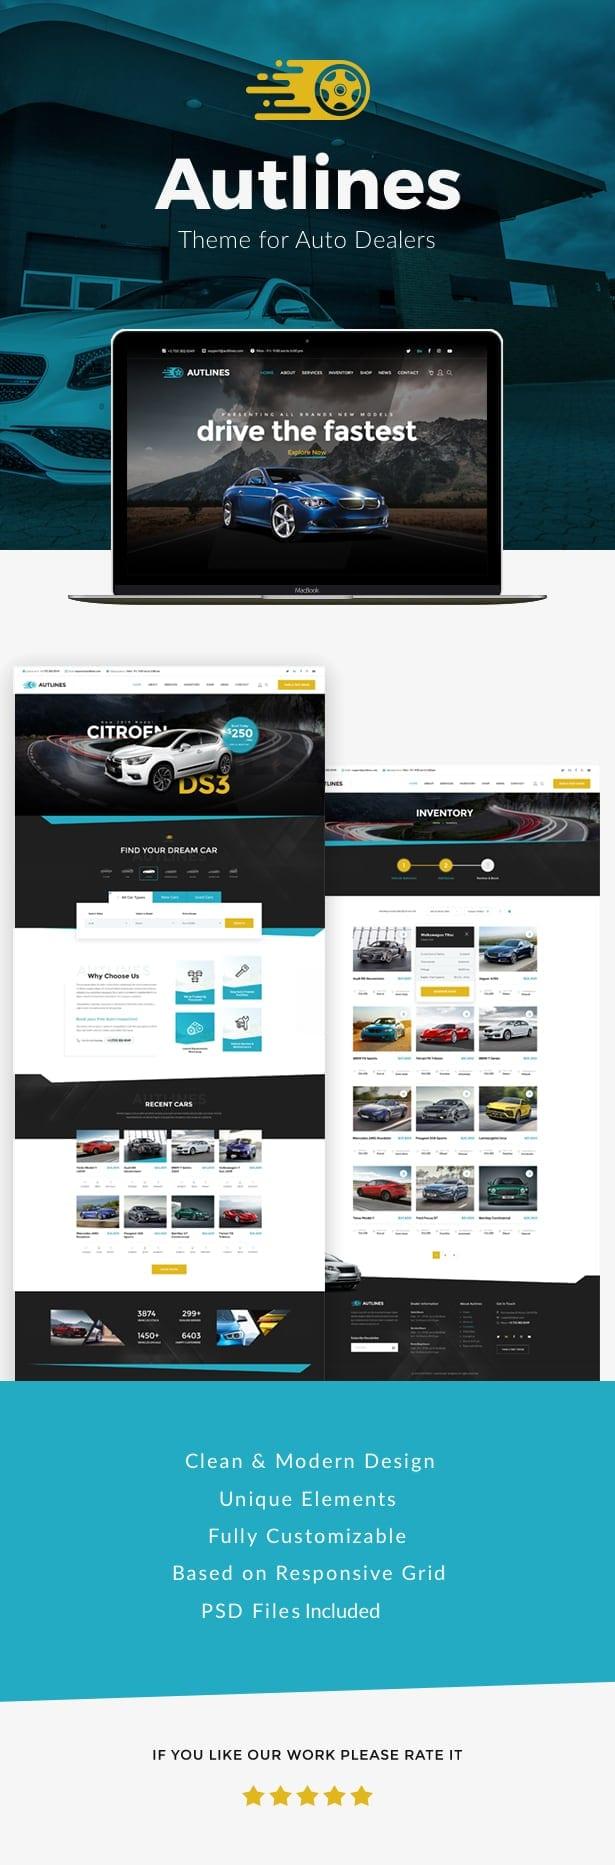 Autlines - Automotive  WordPress Theme - 1